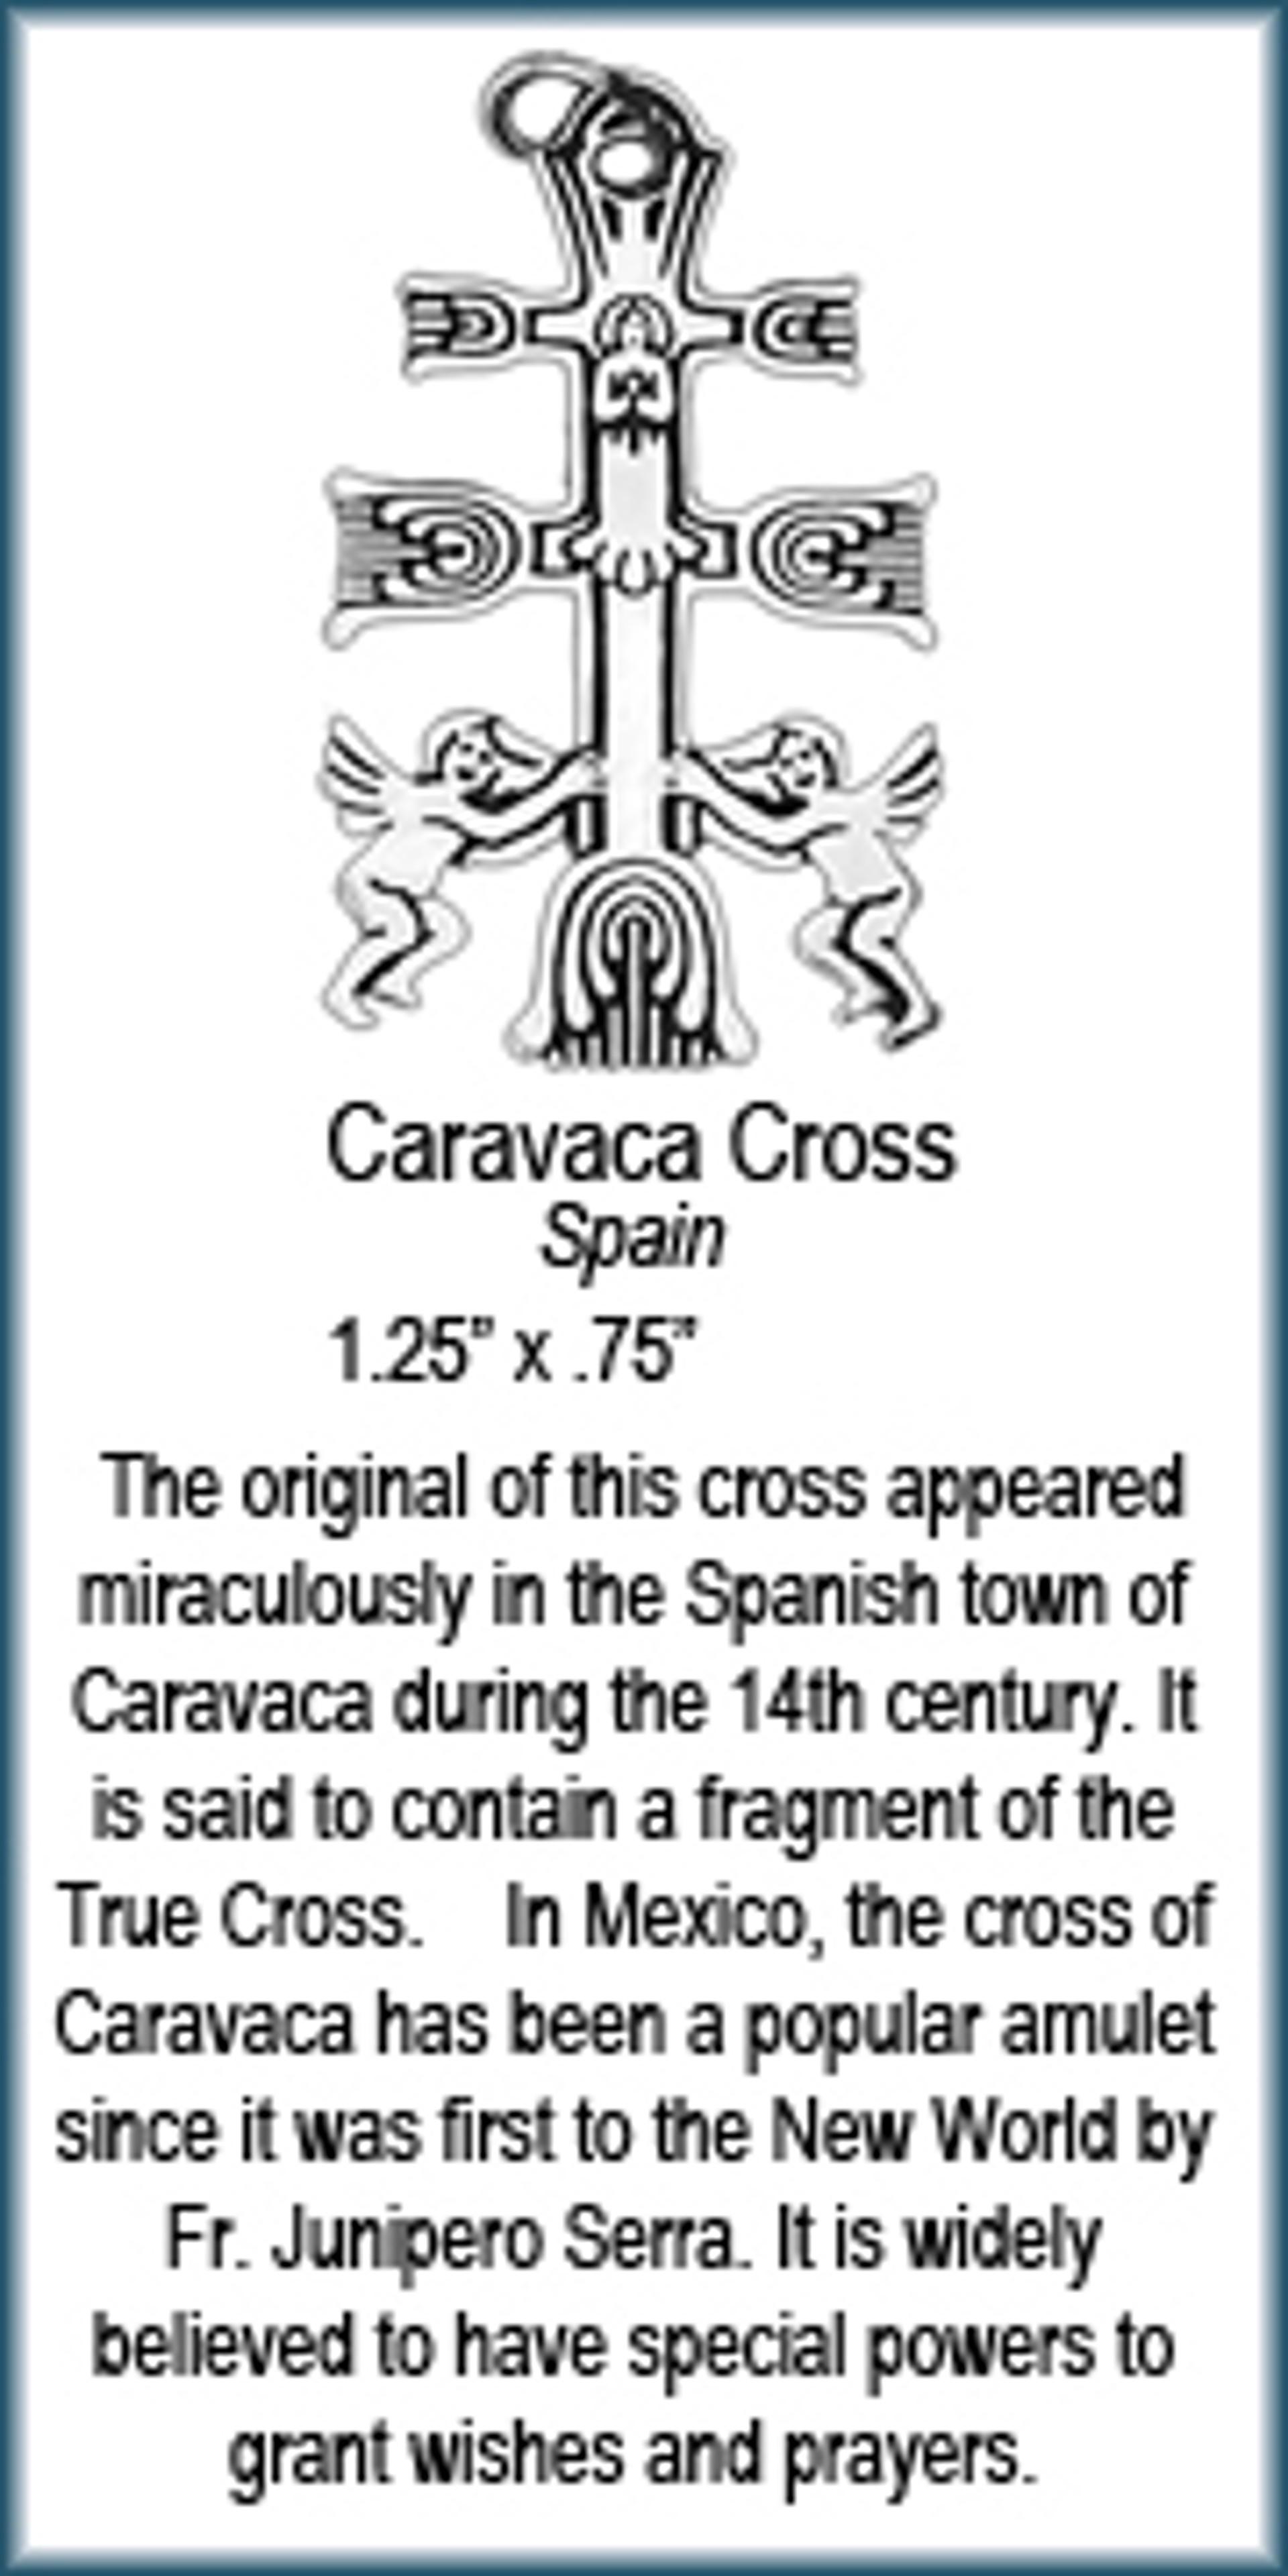 Pendant - Cara Vaca Cross - 6238 by Deanne McKeown